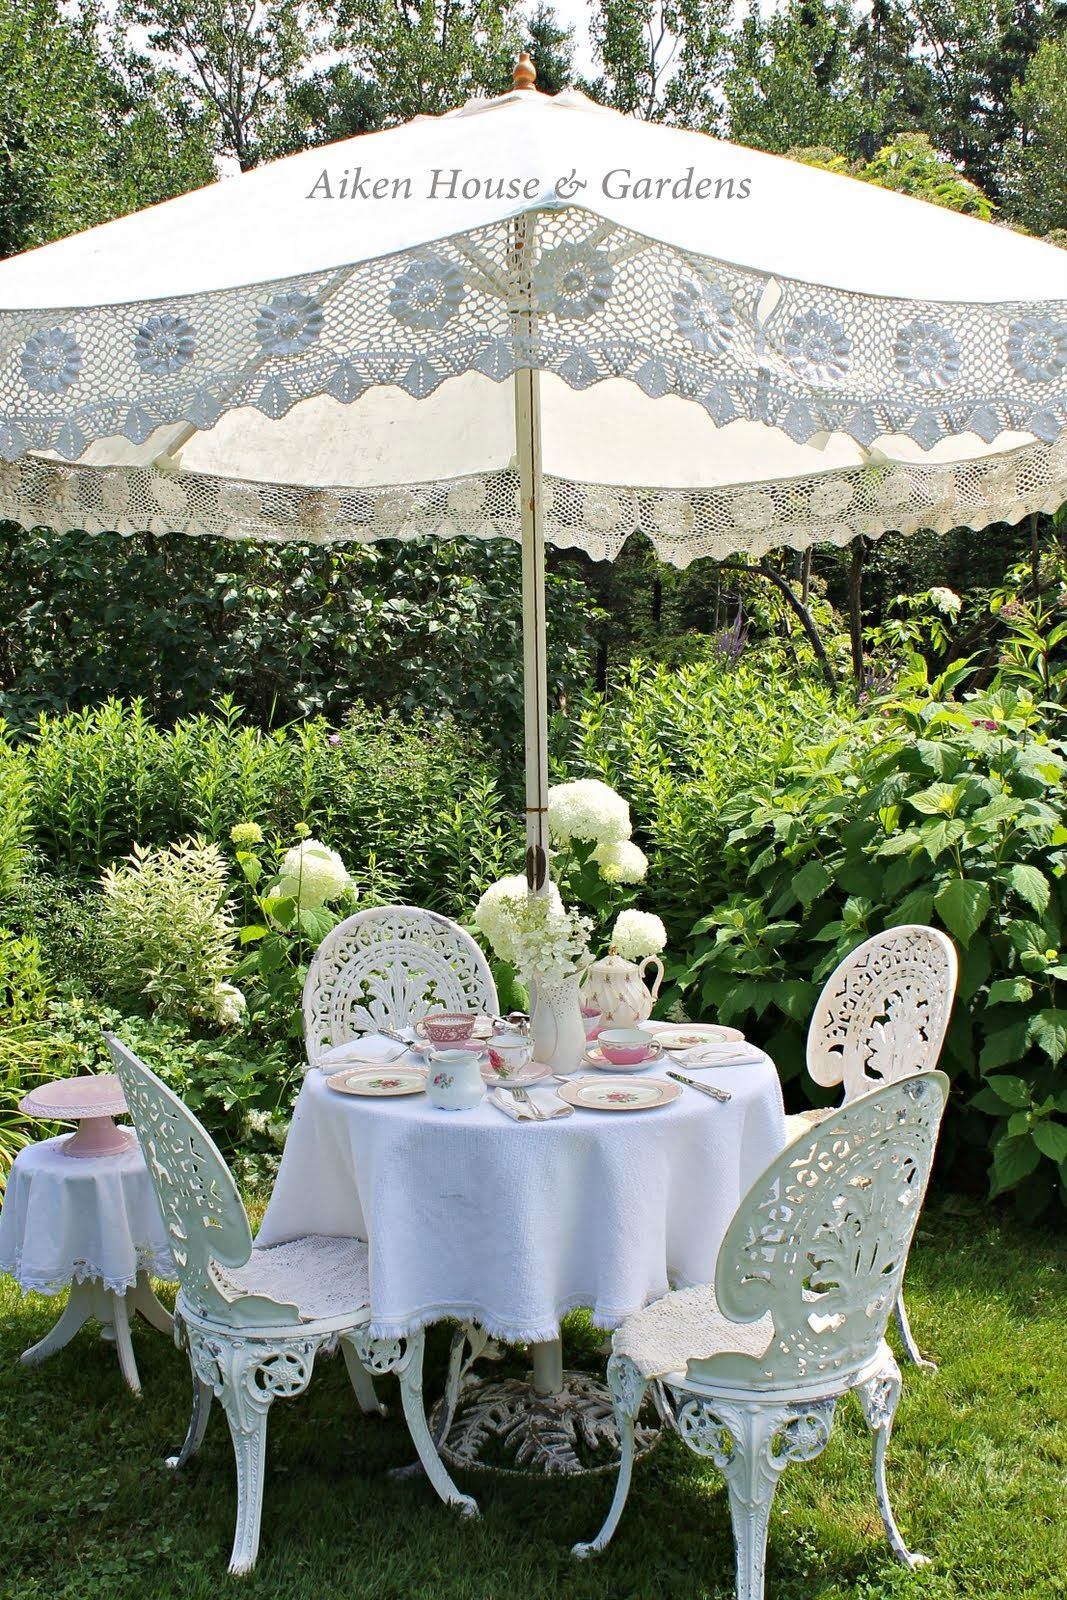 Aiken House & Gardens: Garden Relaxation   Jardins, Jardin ... pour Salon De Jardin Romantique